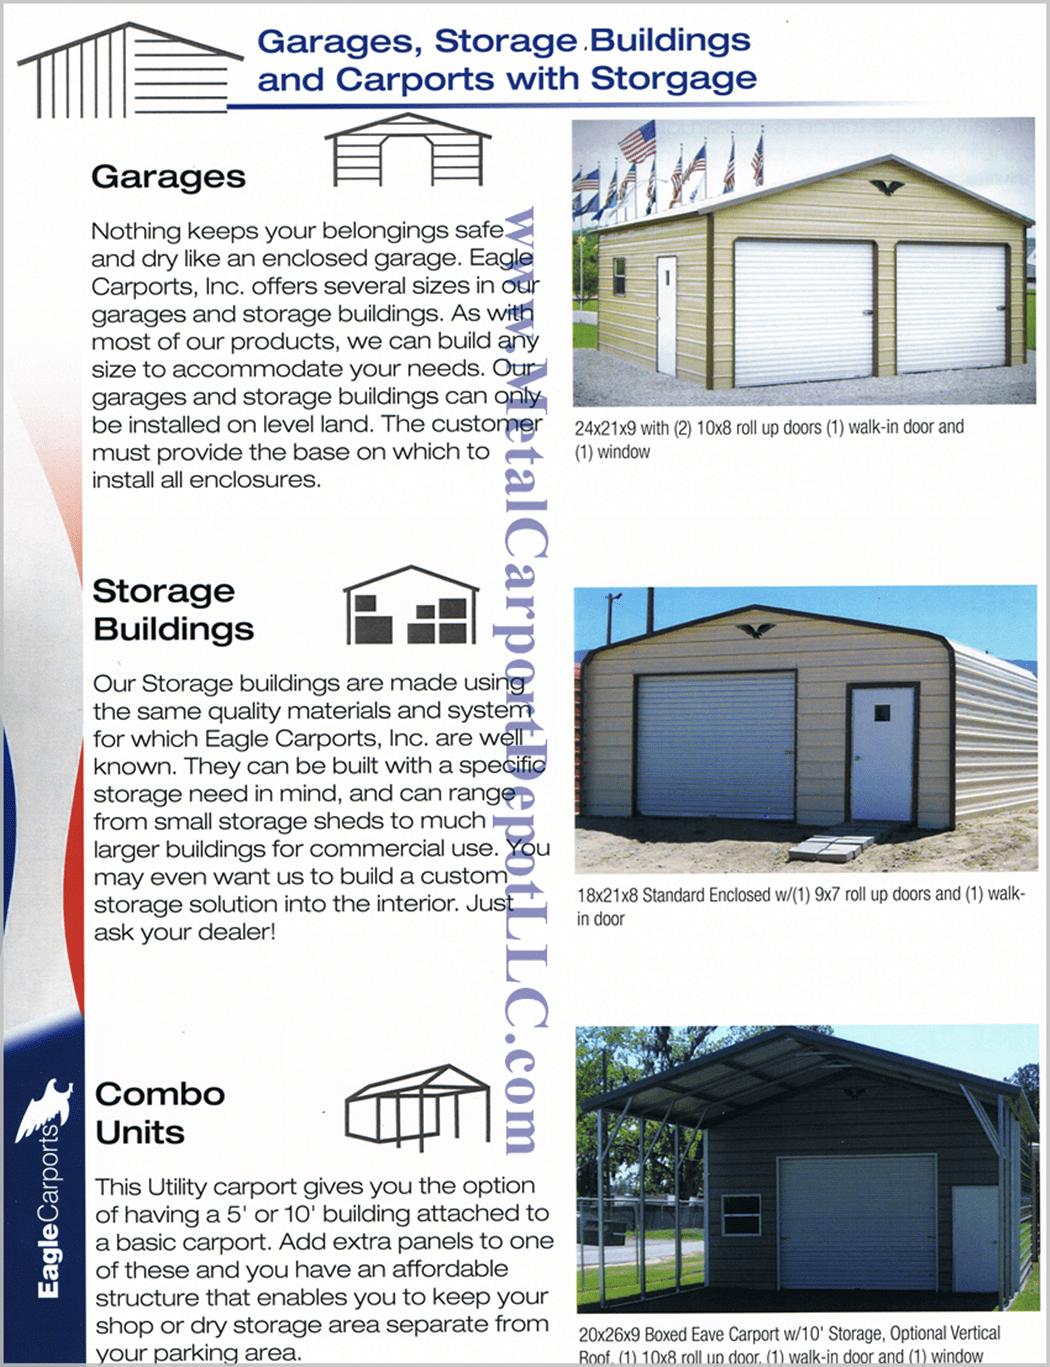 Enclosed Garages Metal Carports With Storage Information min